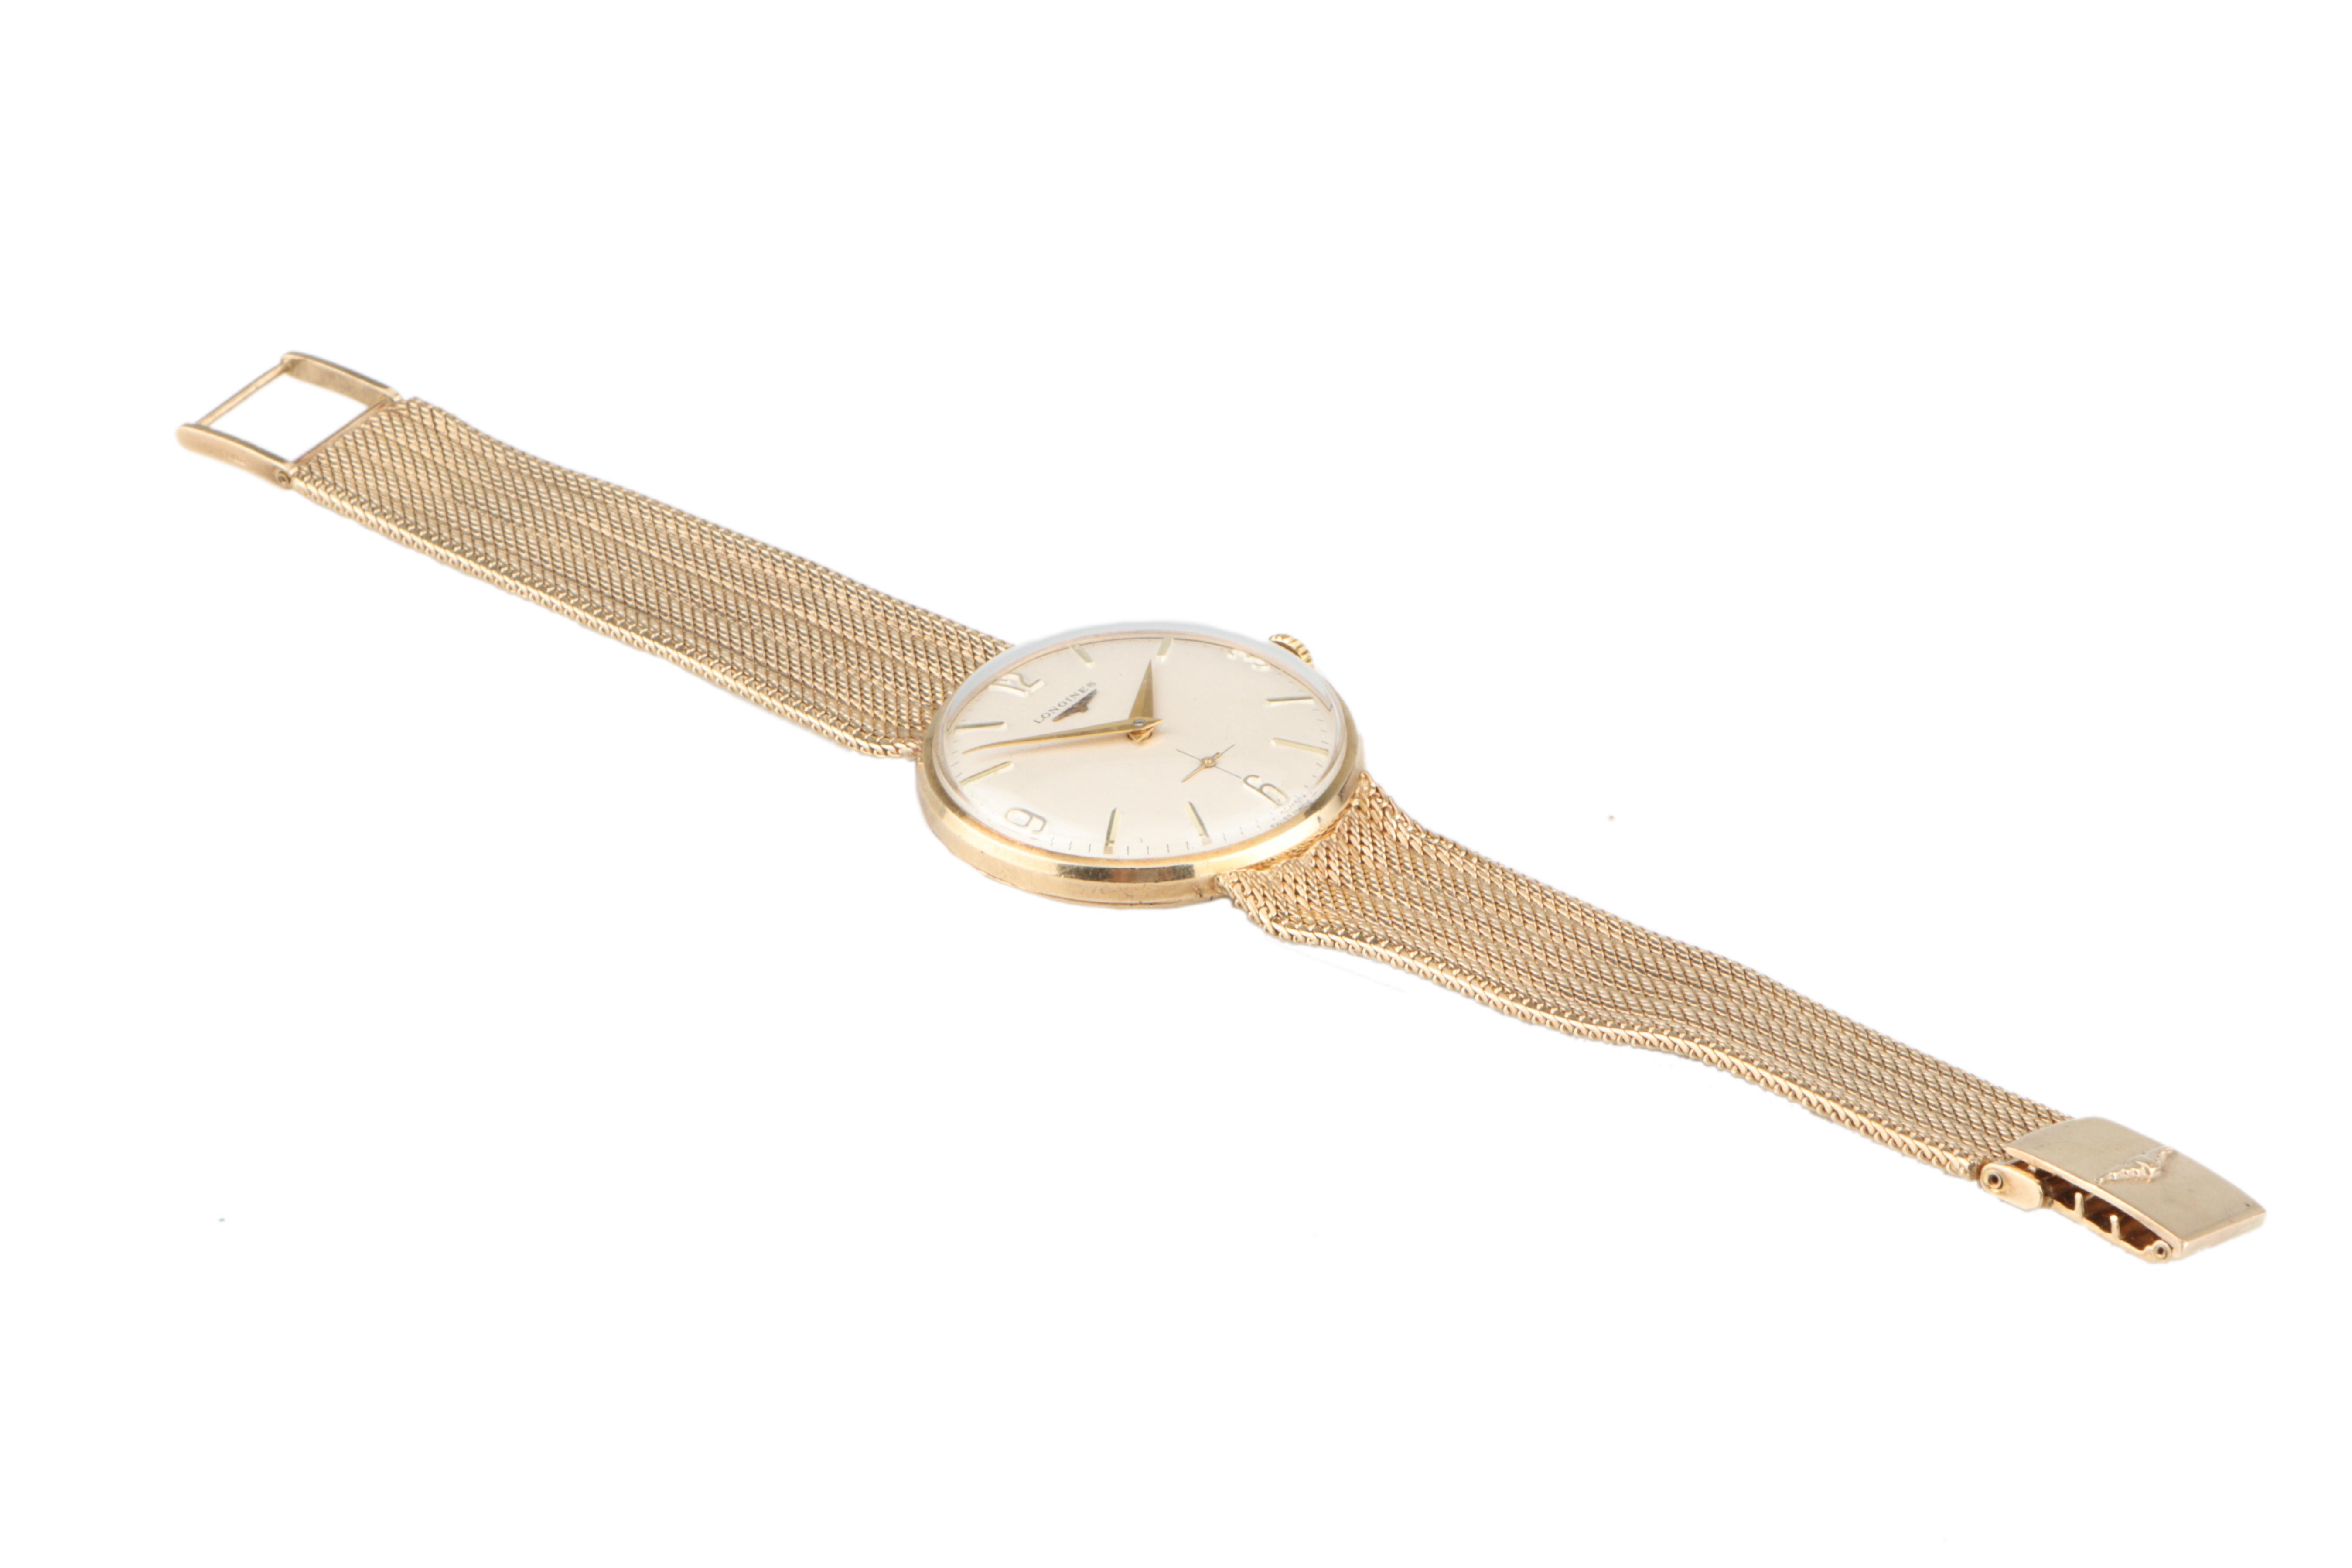 A Fine Gentleman's Longines Gold Wristwatch, - Image 3 of 3